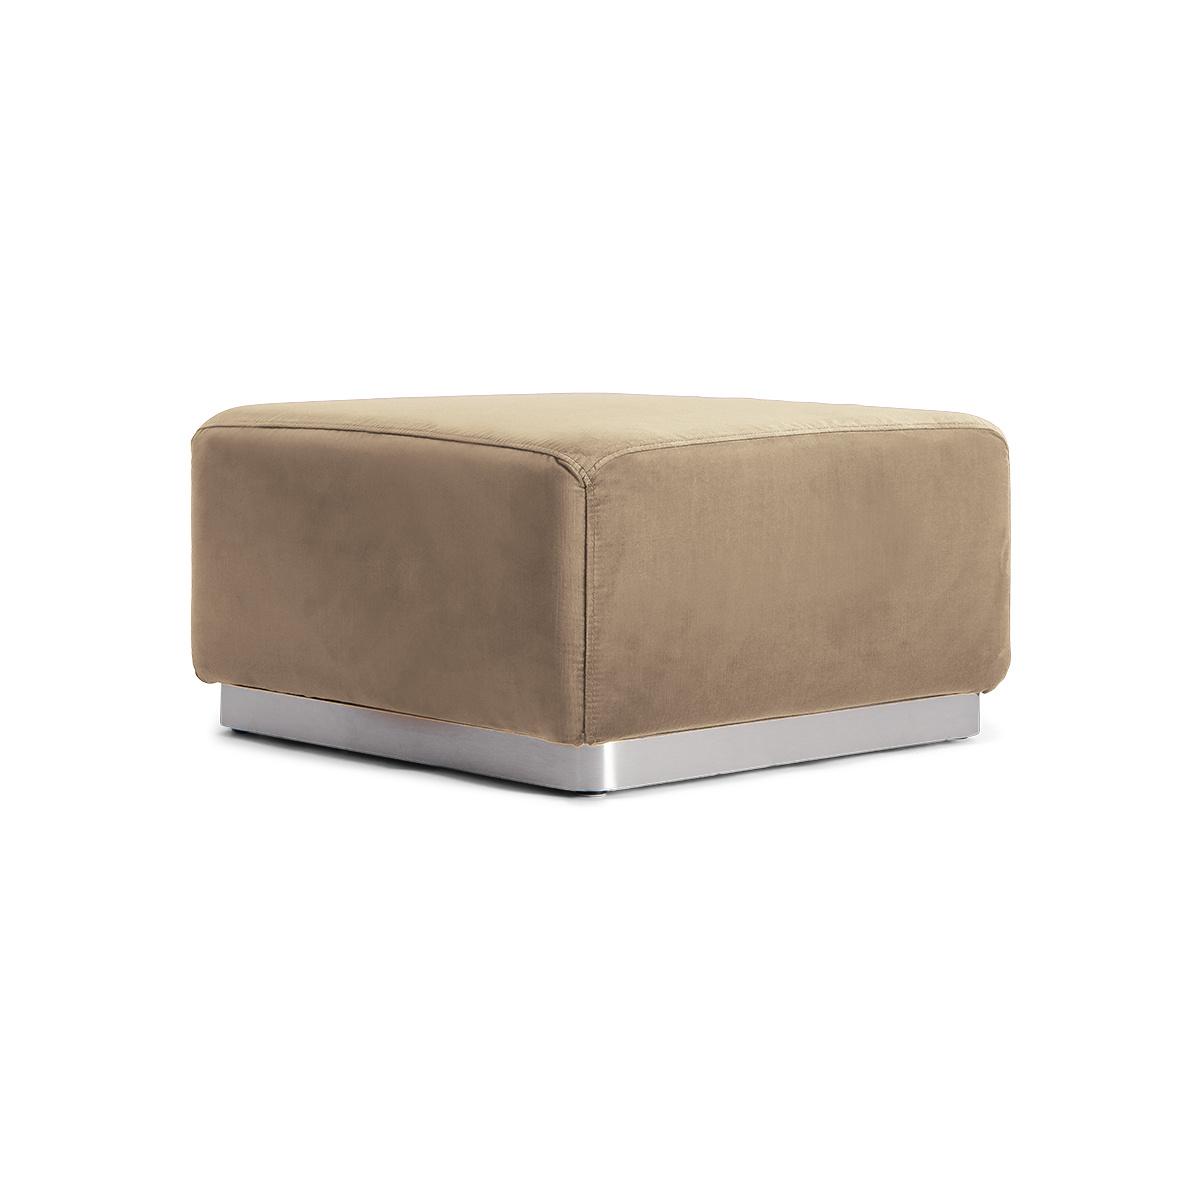 Rotondo Footstool in Camel Velvet